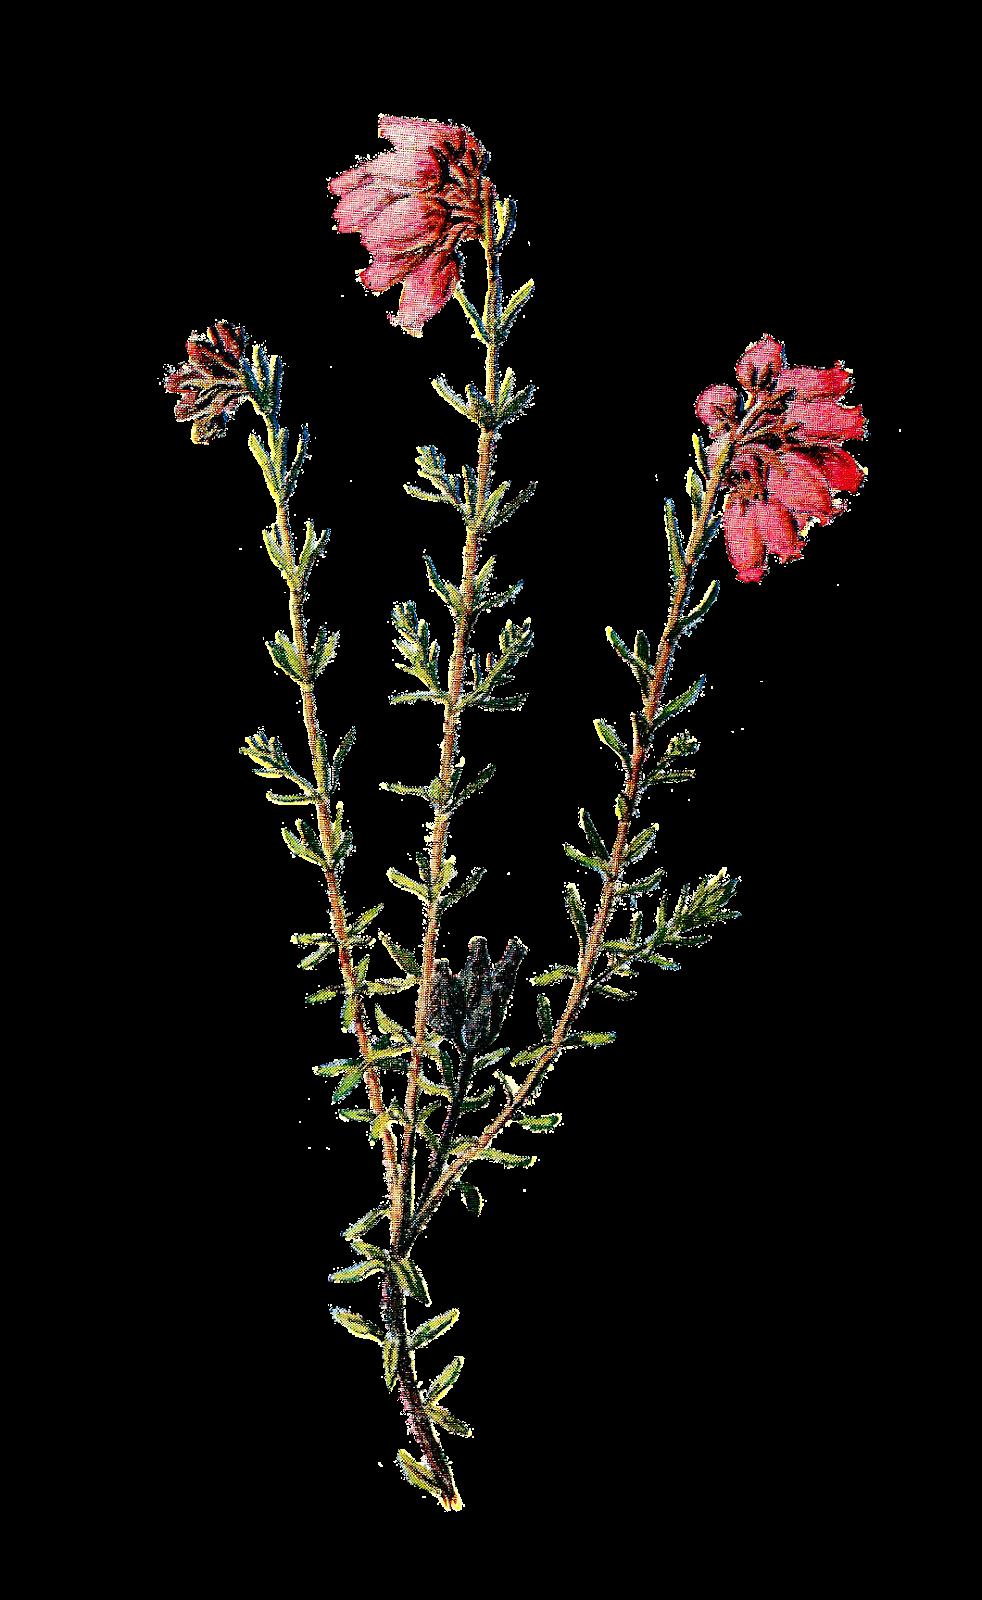 982x1600 Antique Images Vintage Scrapbooking Wildflower Clip Art Of Flower